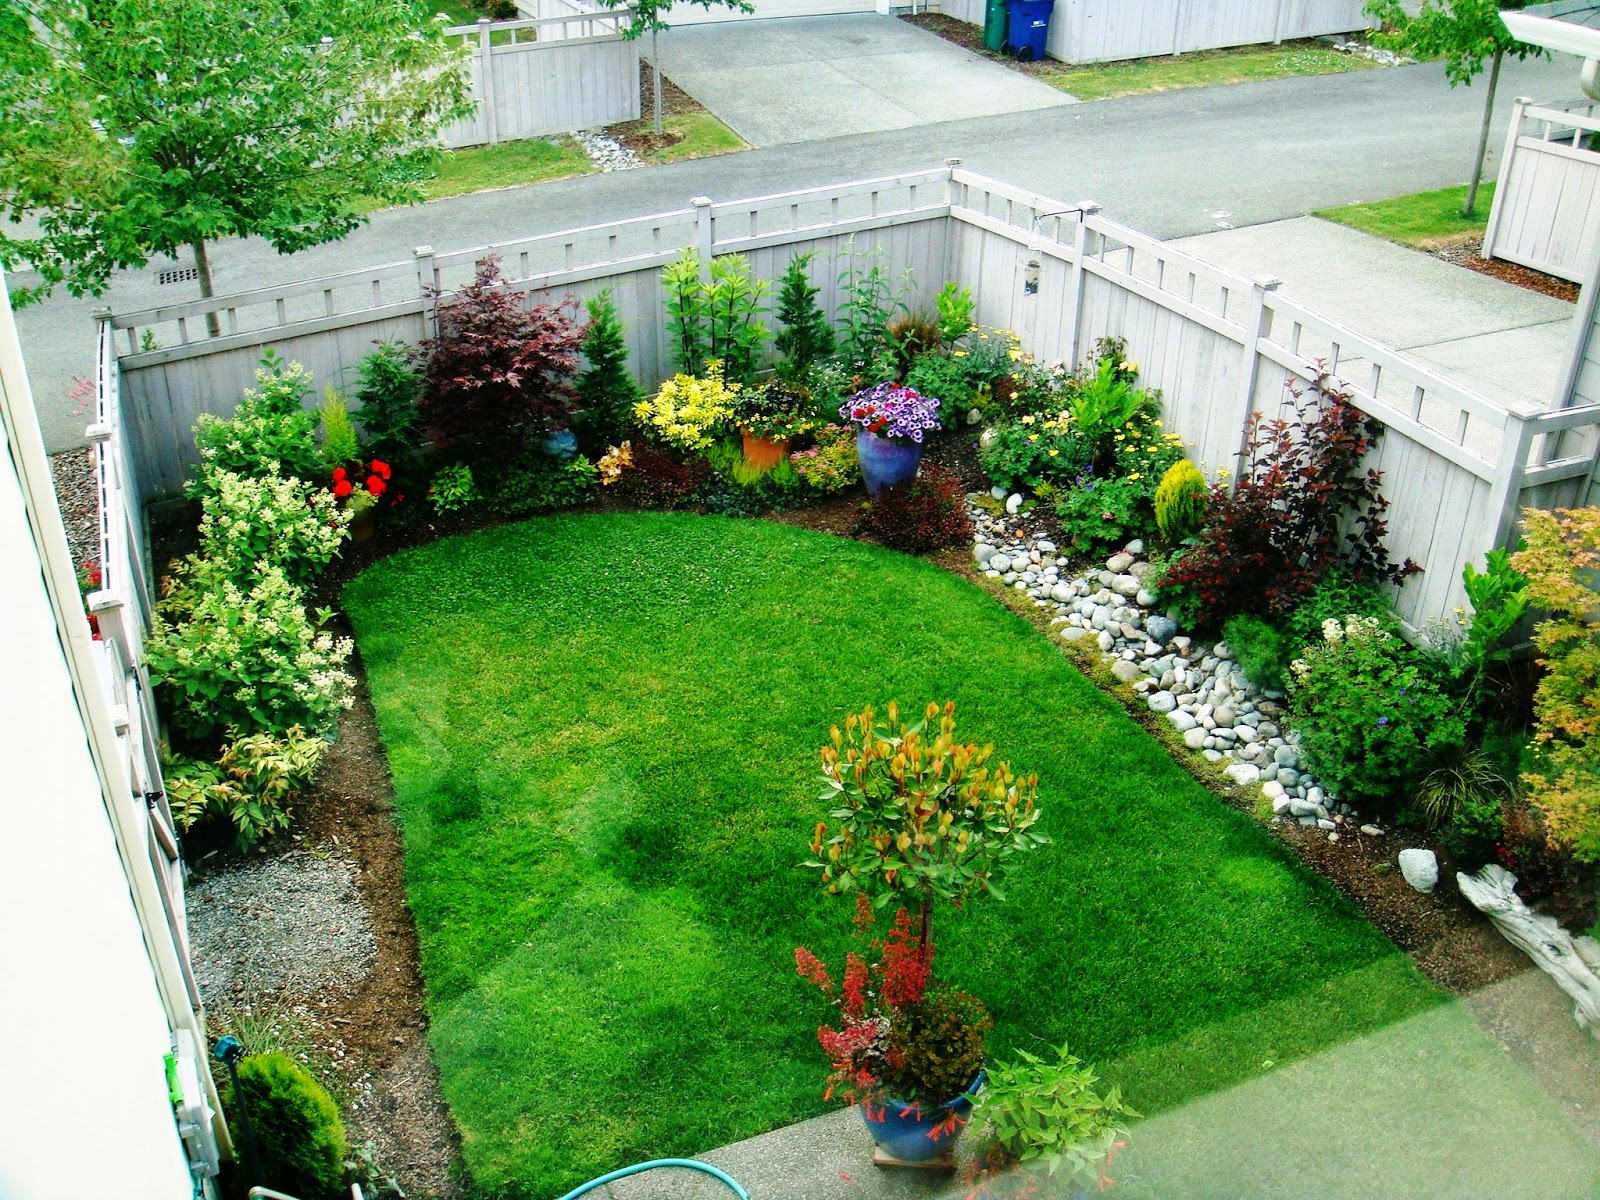 Contoh Desain Taman Depan & Belakang Rumah Masa Kini